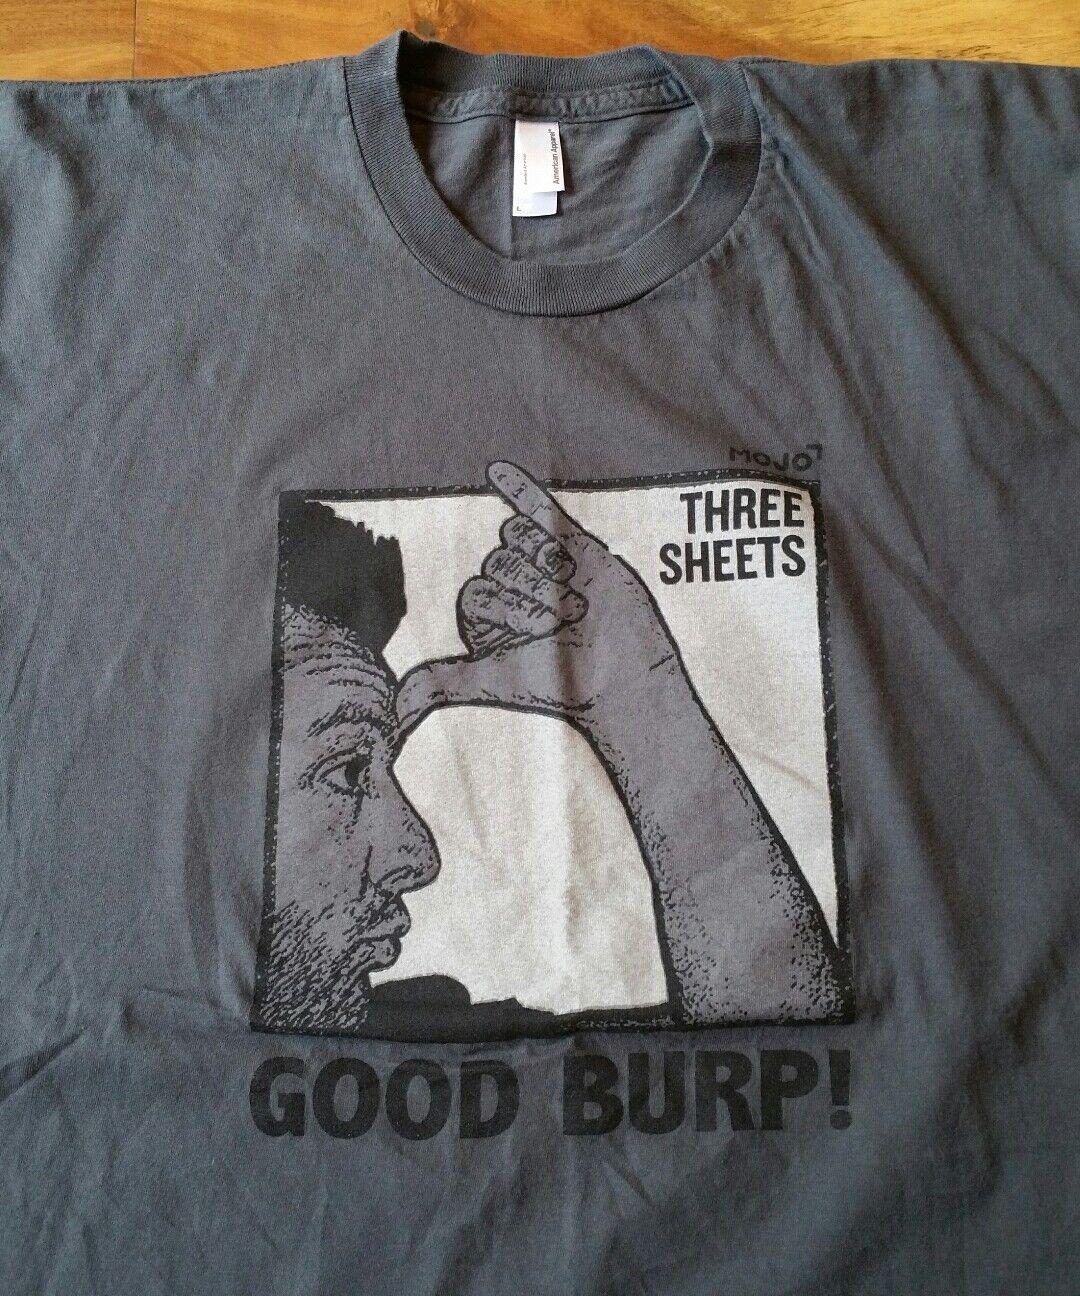 Mojo Three Sheets Good Burp  Zane Lamprey T-Shirt Men Large Beer tee Pub Crawl